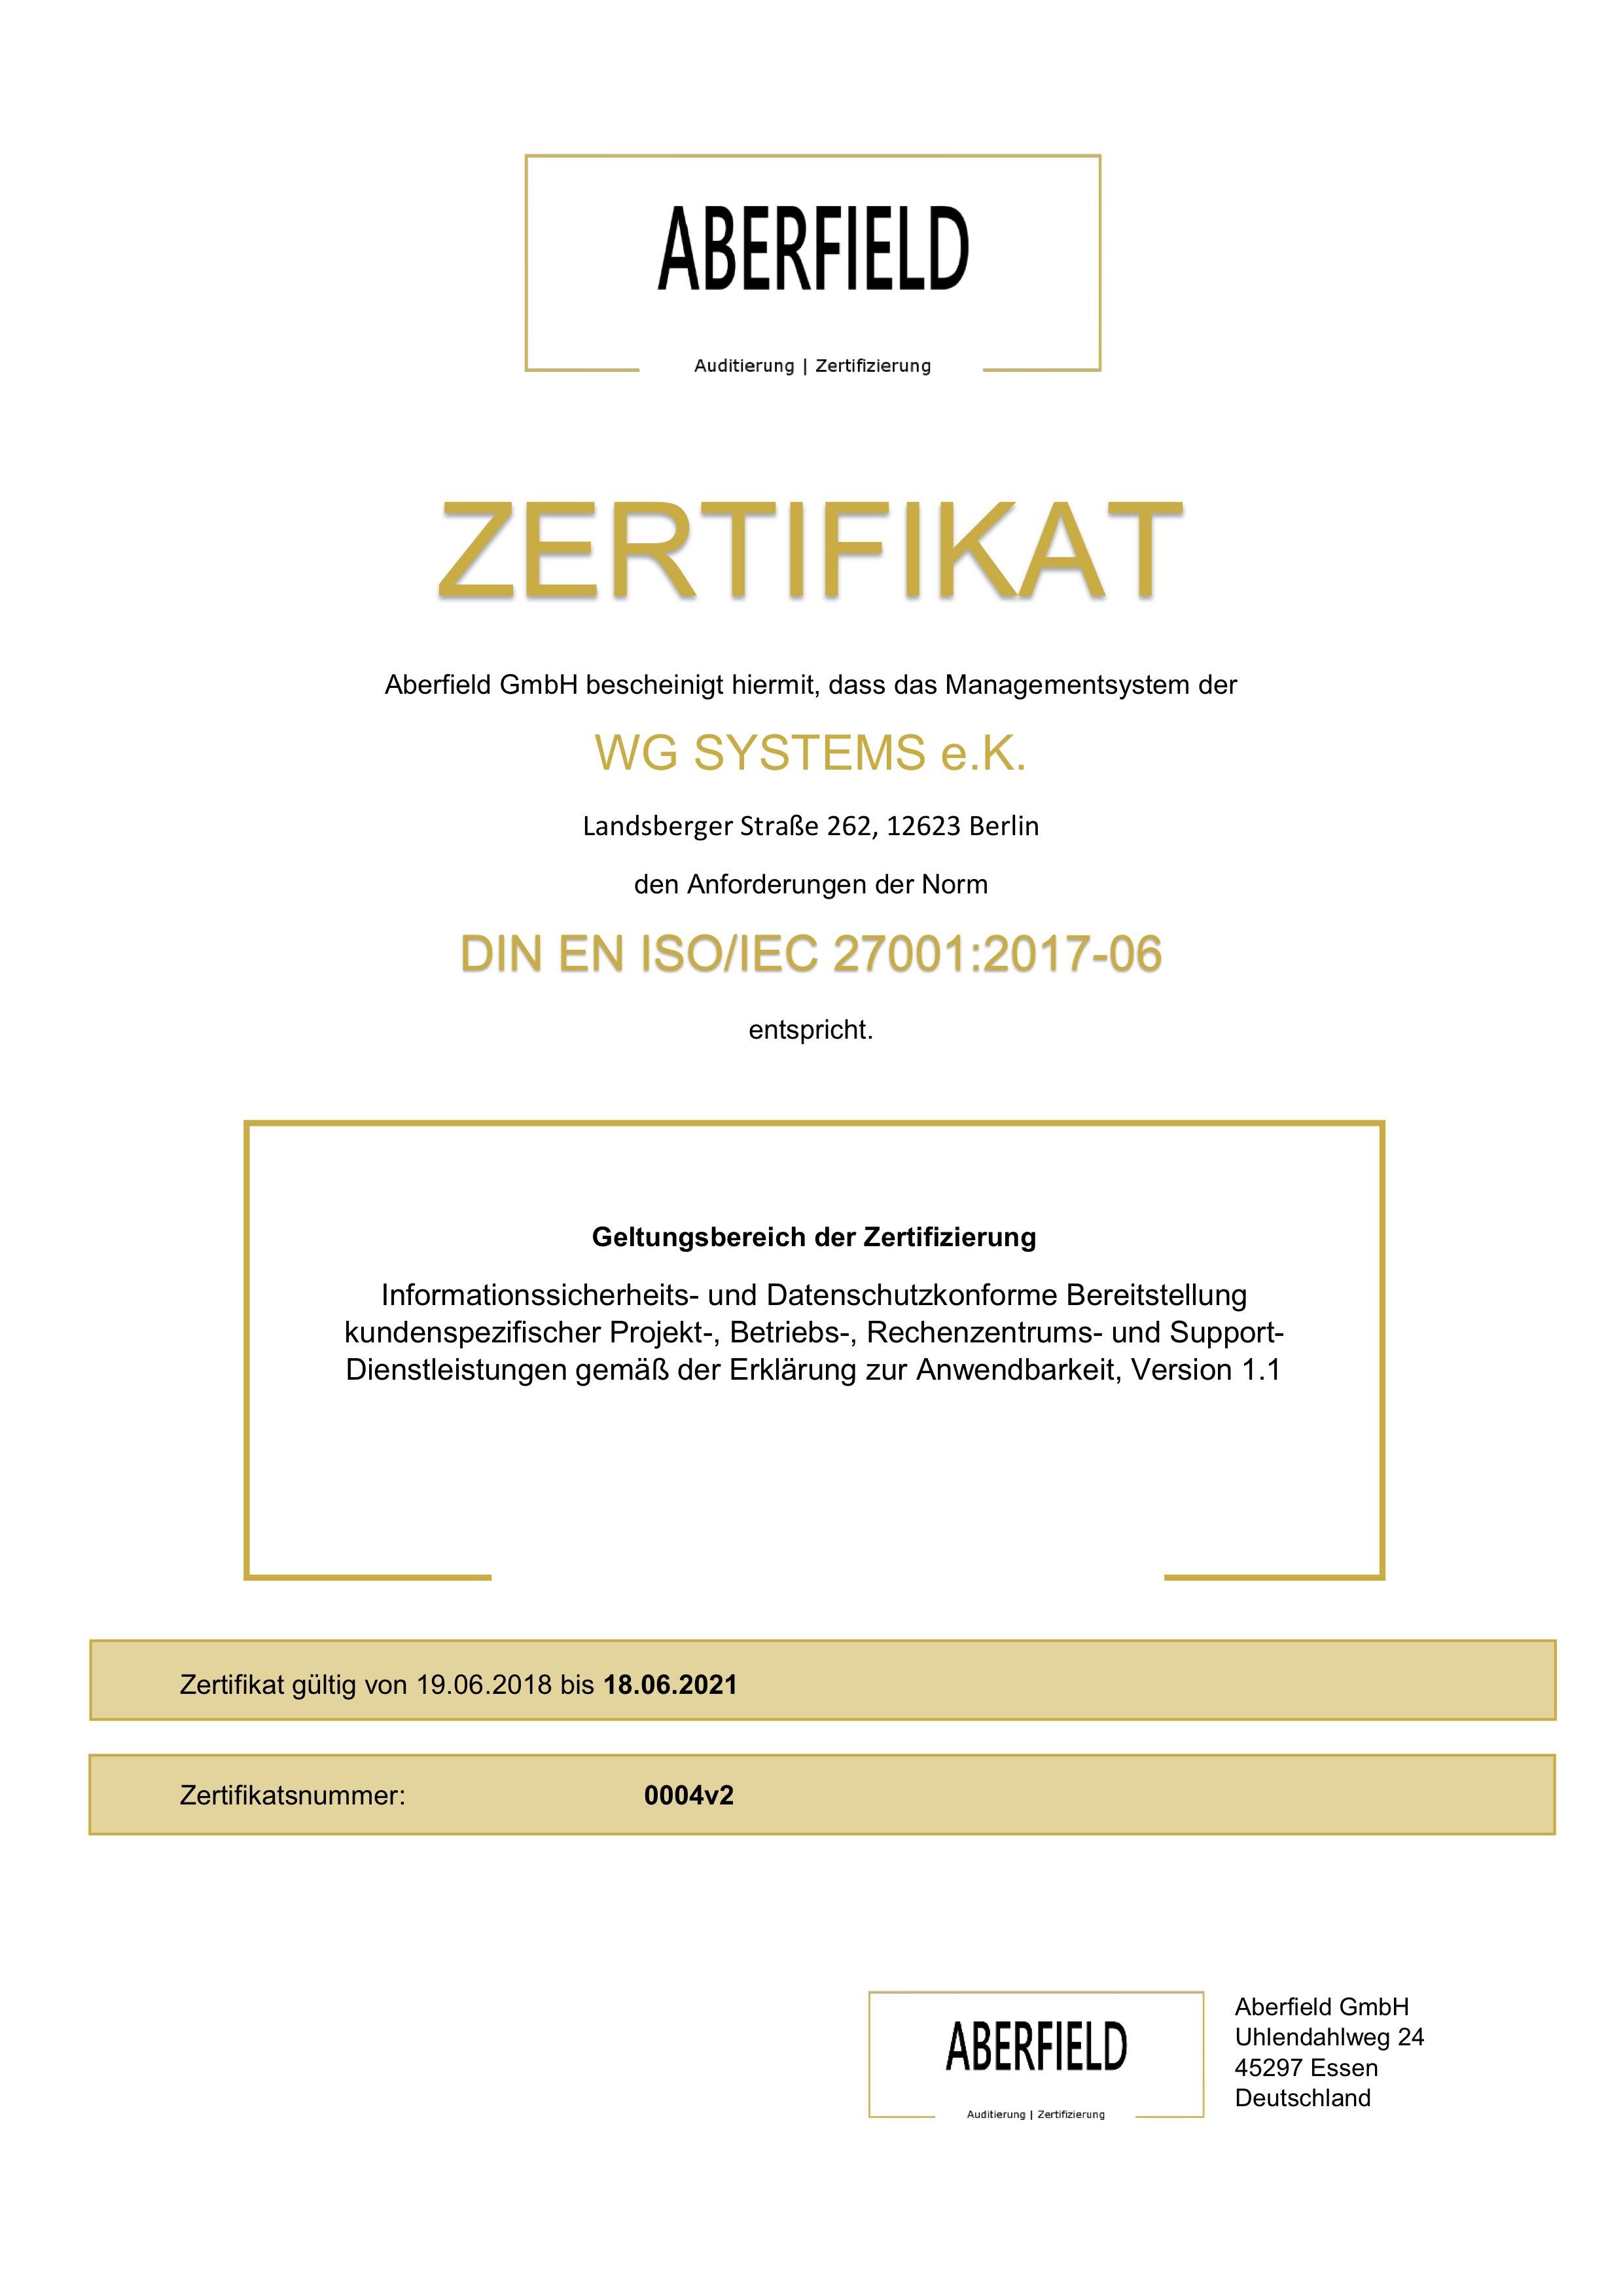 Zertifikat 0004v1 ISO IEC 27001 WG